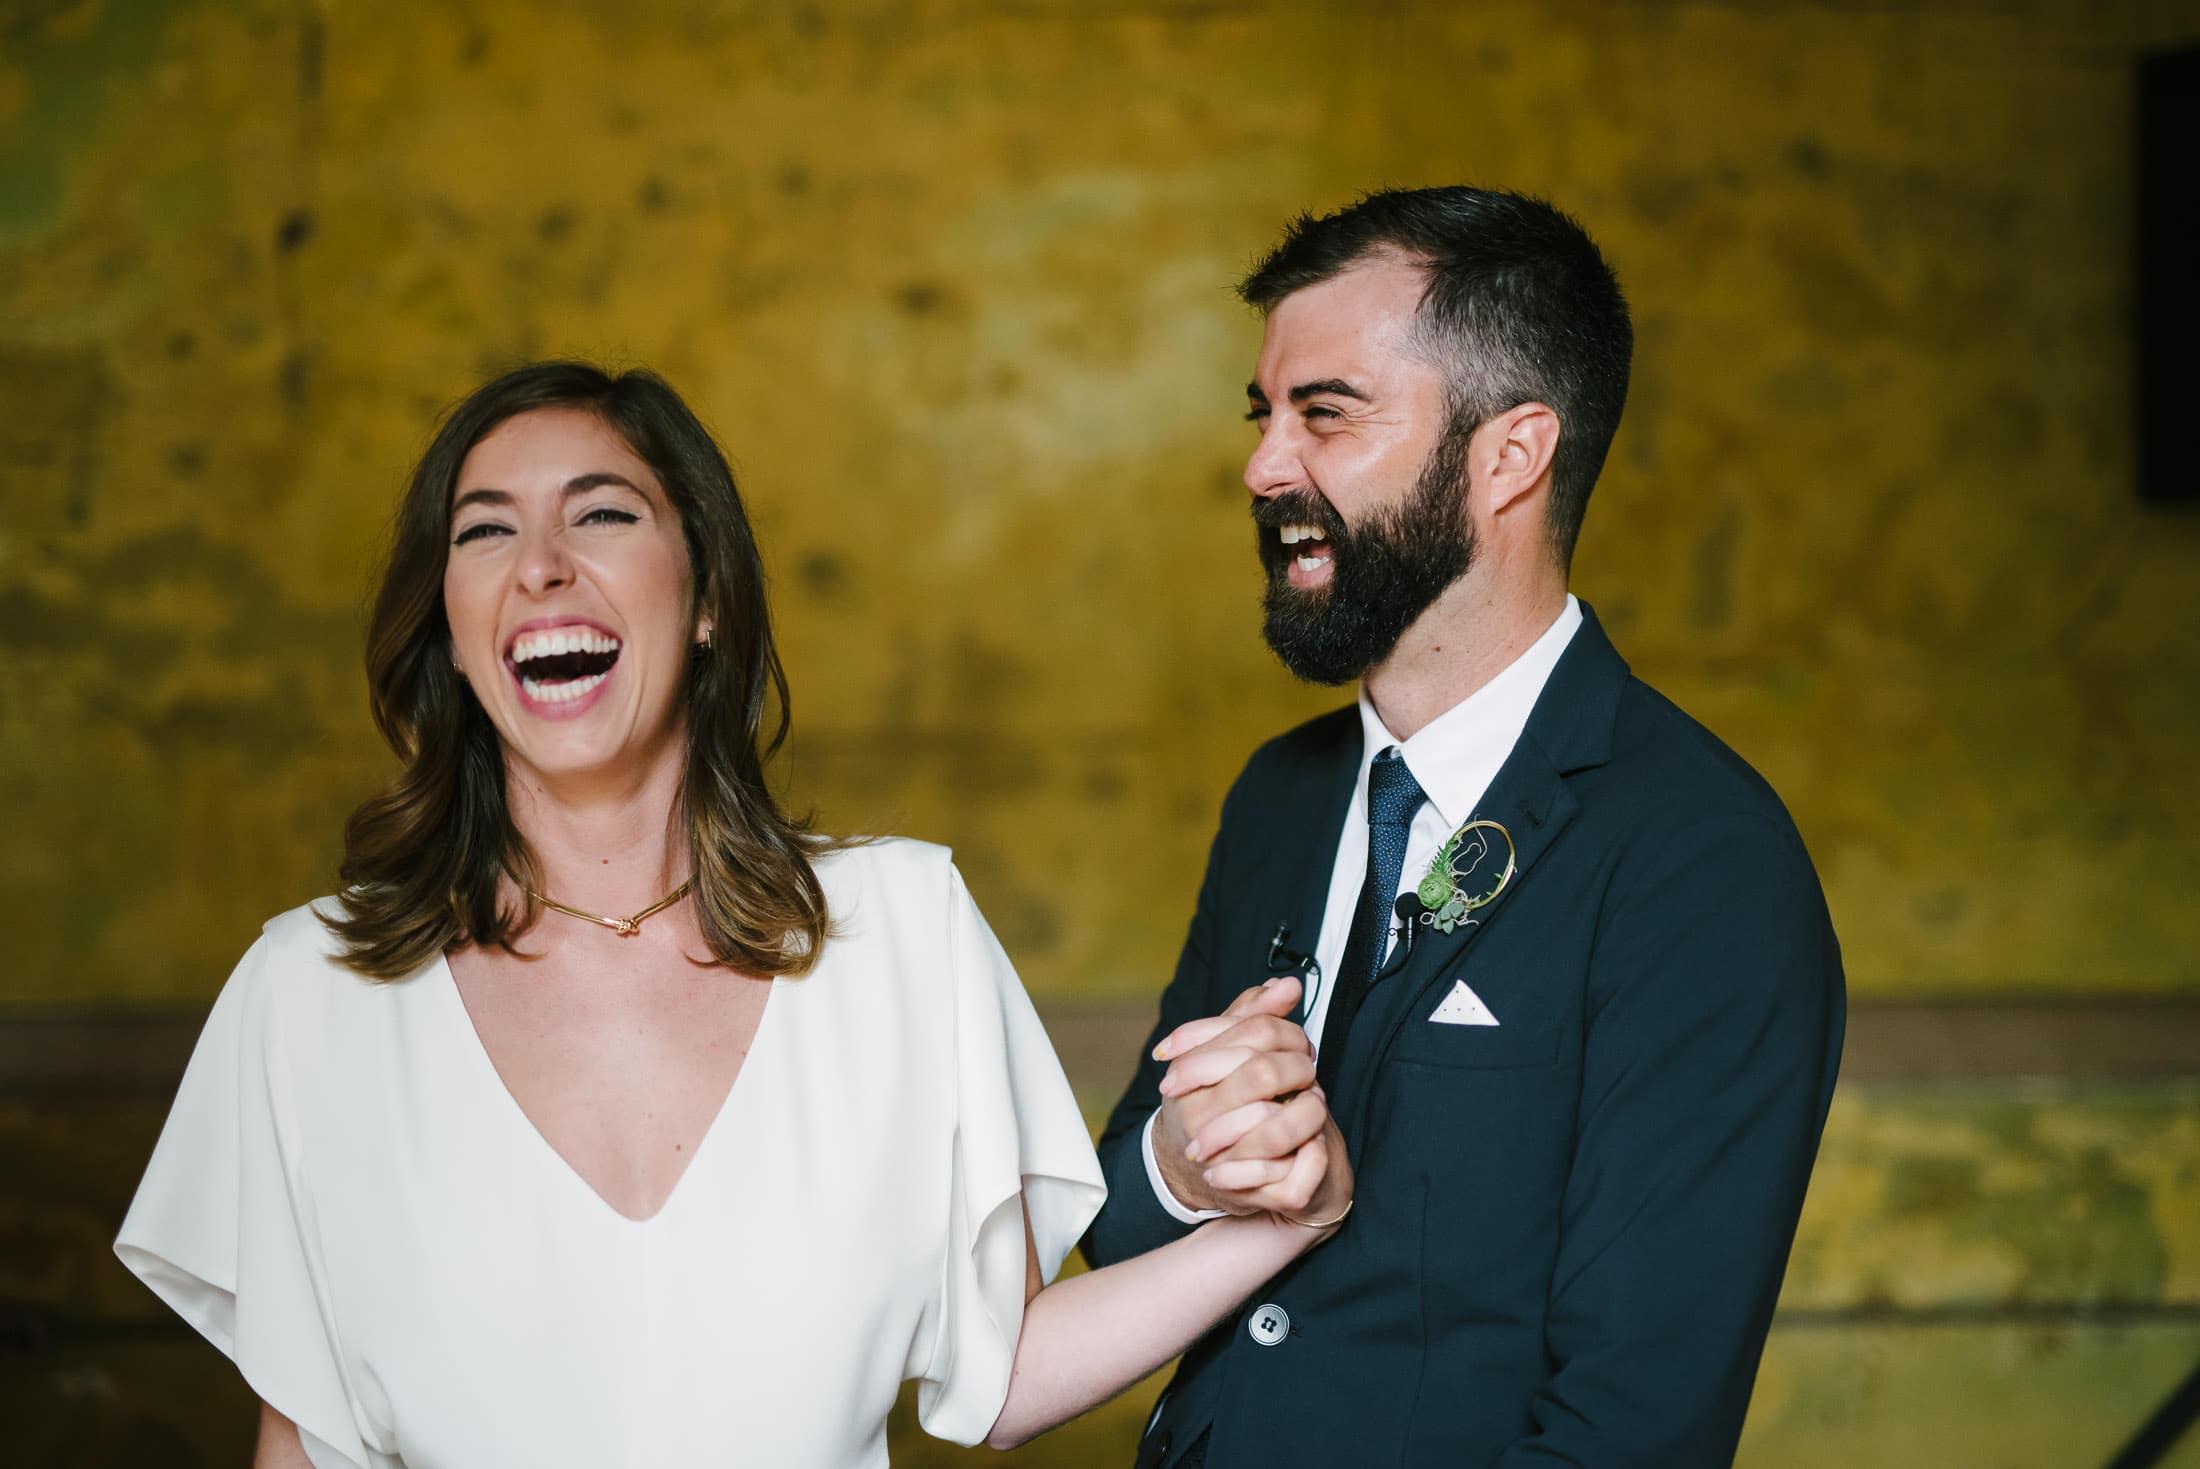 Marin Headland Center for the Arts Wedding Portrait